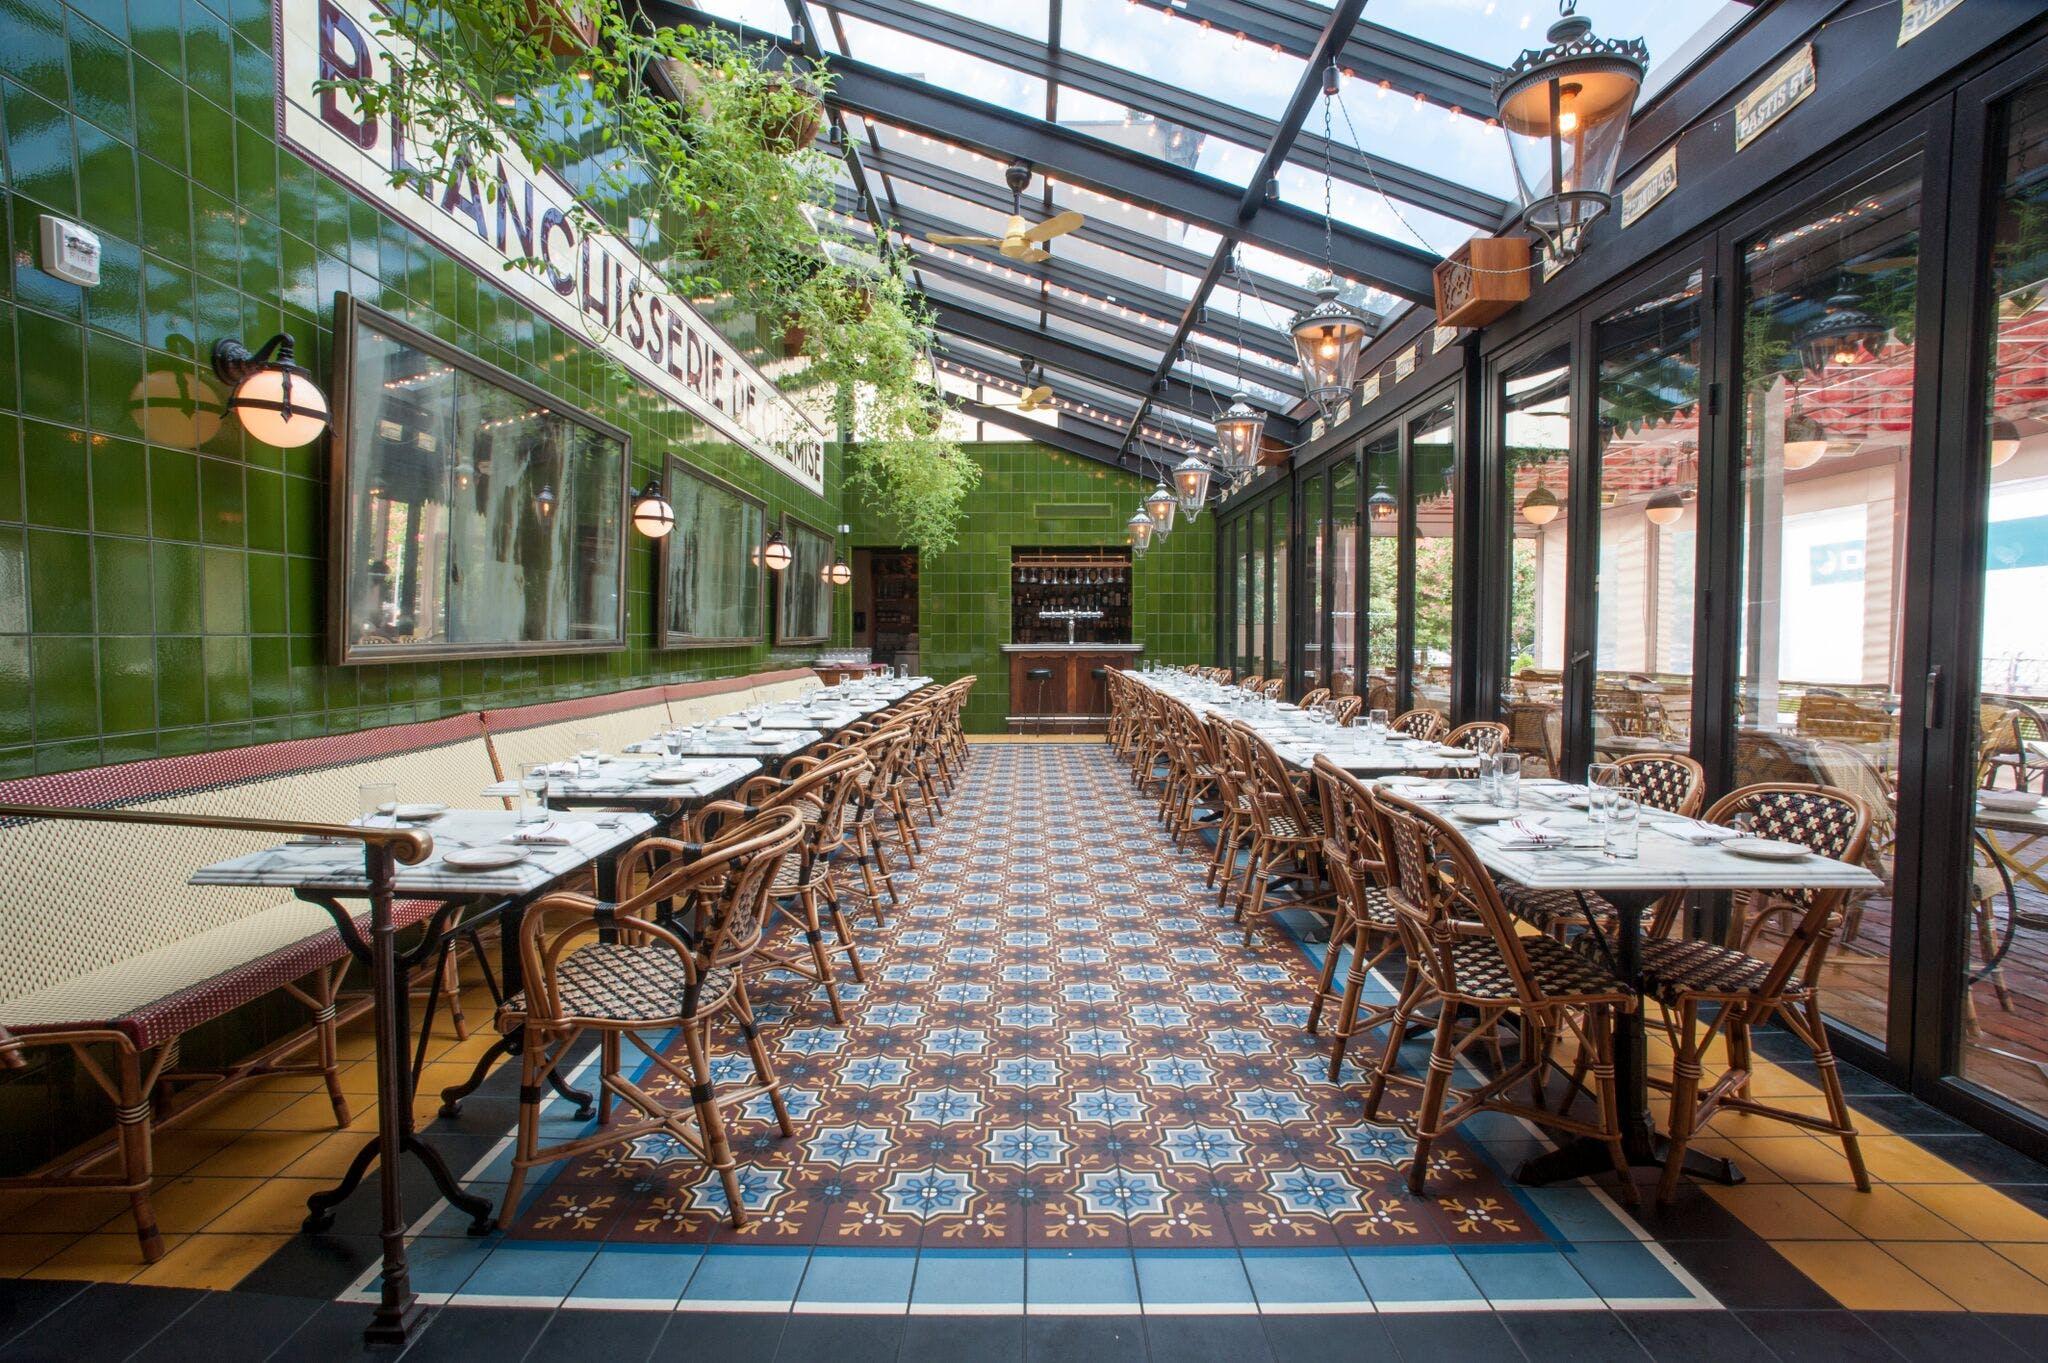 Washington Dc Restaurant Reviews The Infatuation